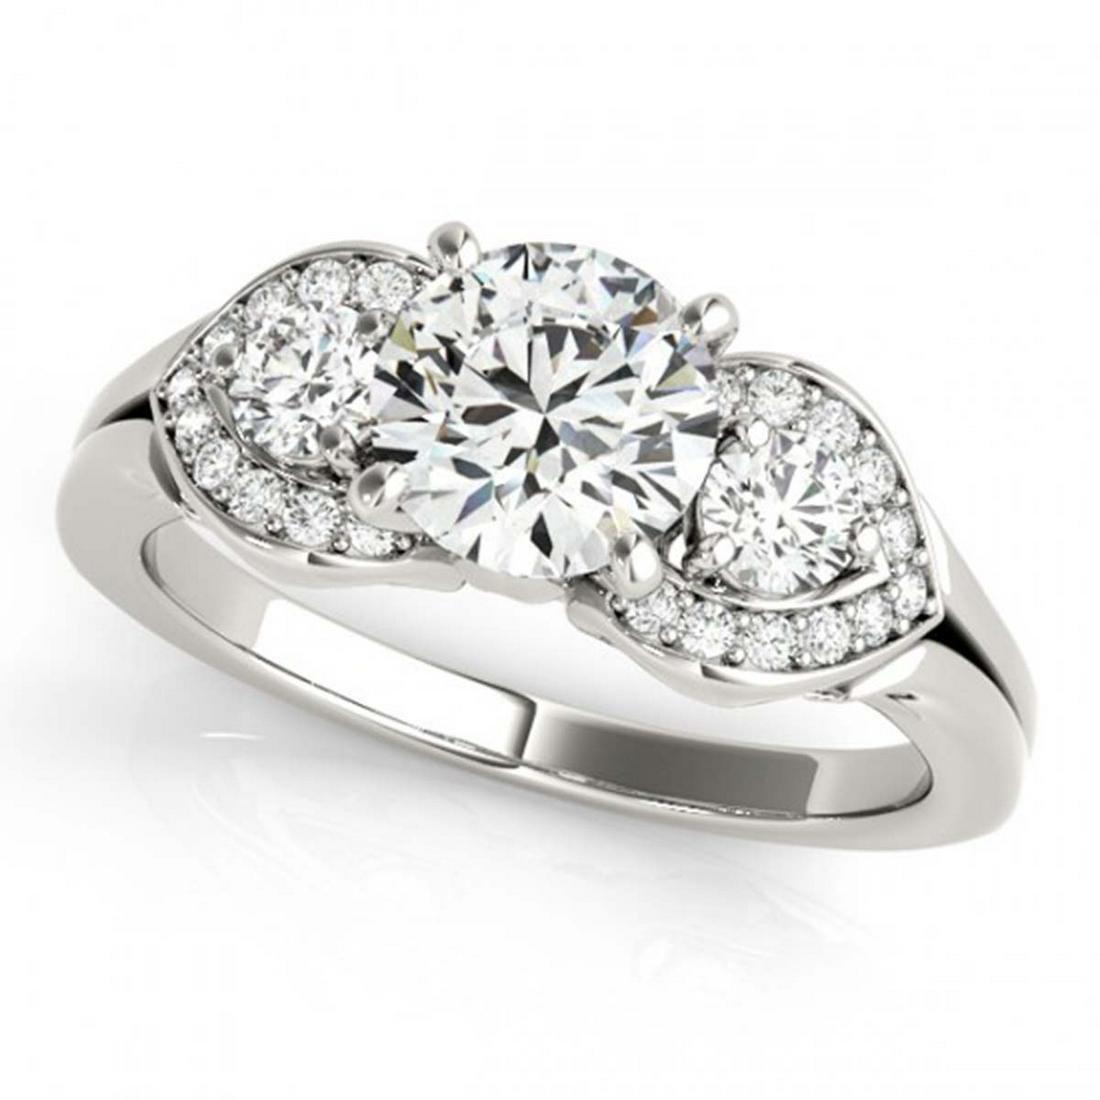 1.45 ctw VS/SI Diamond 3 Stone Ring 14K White Gold -